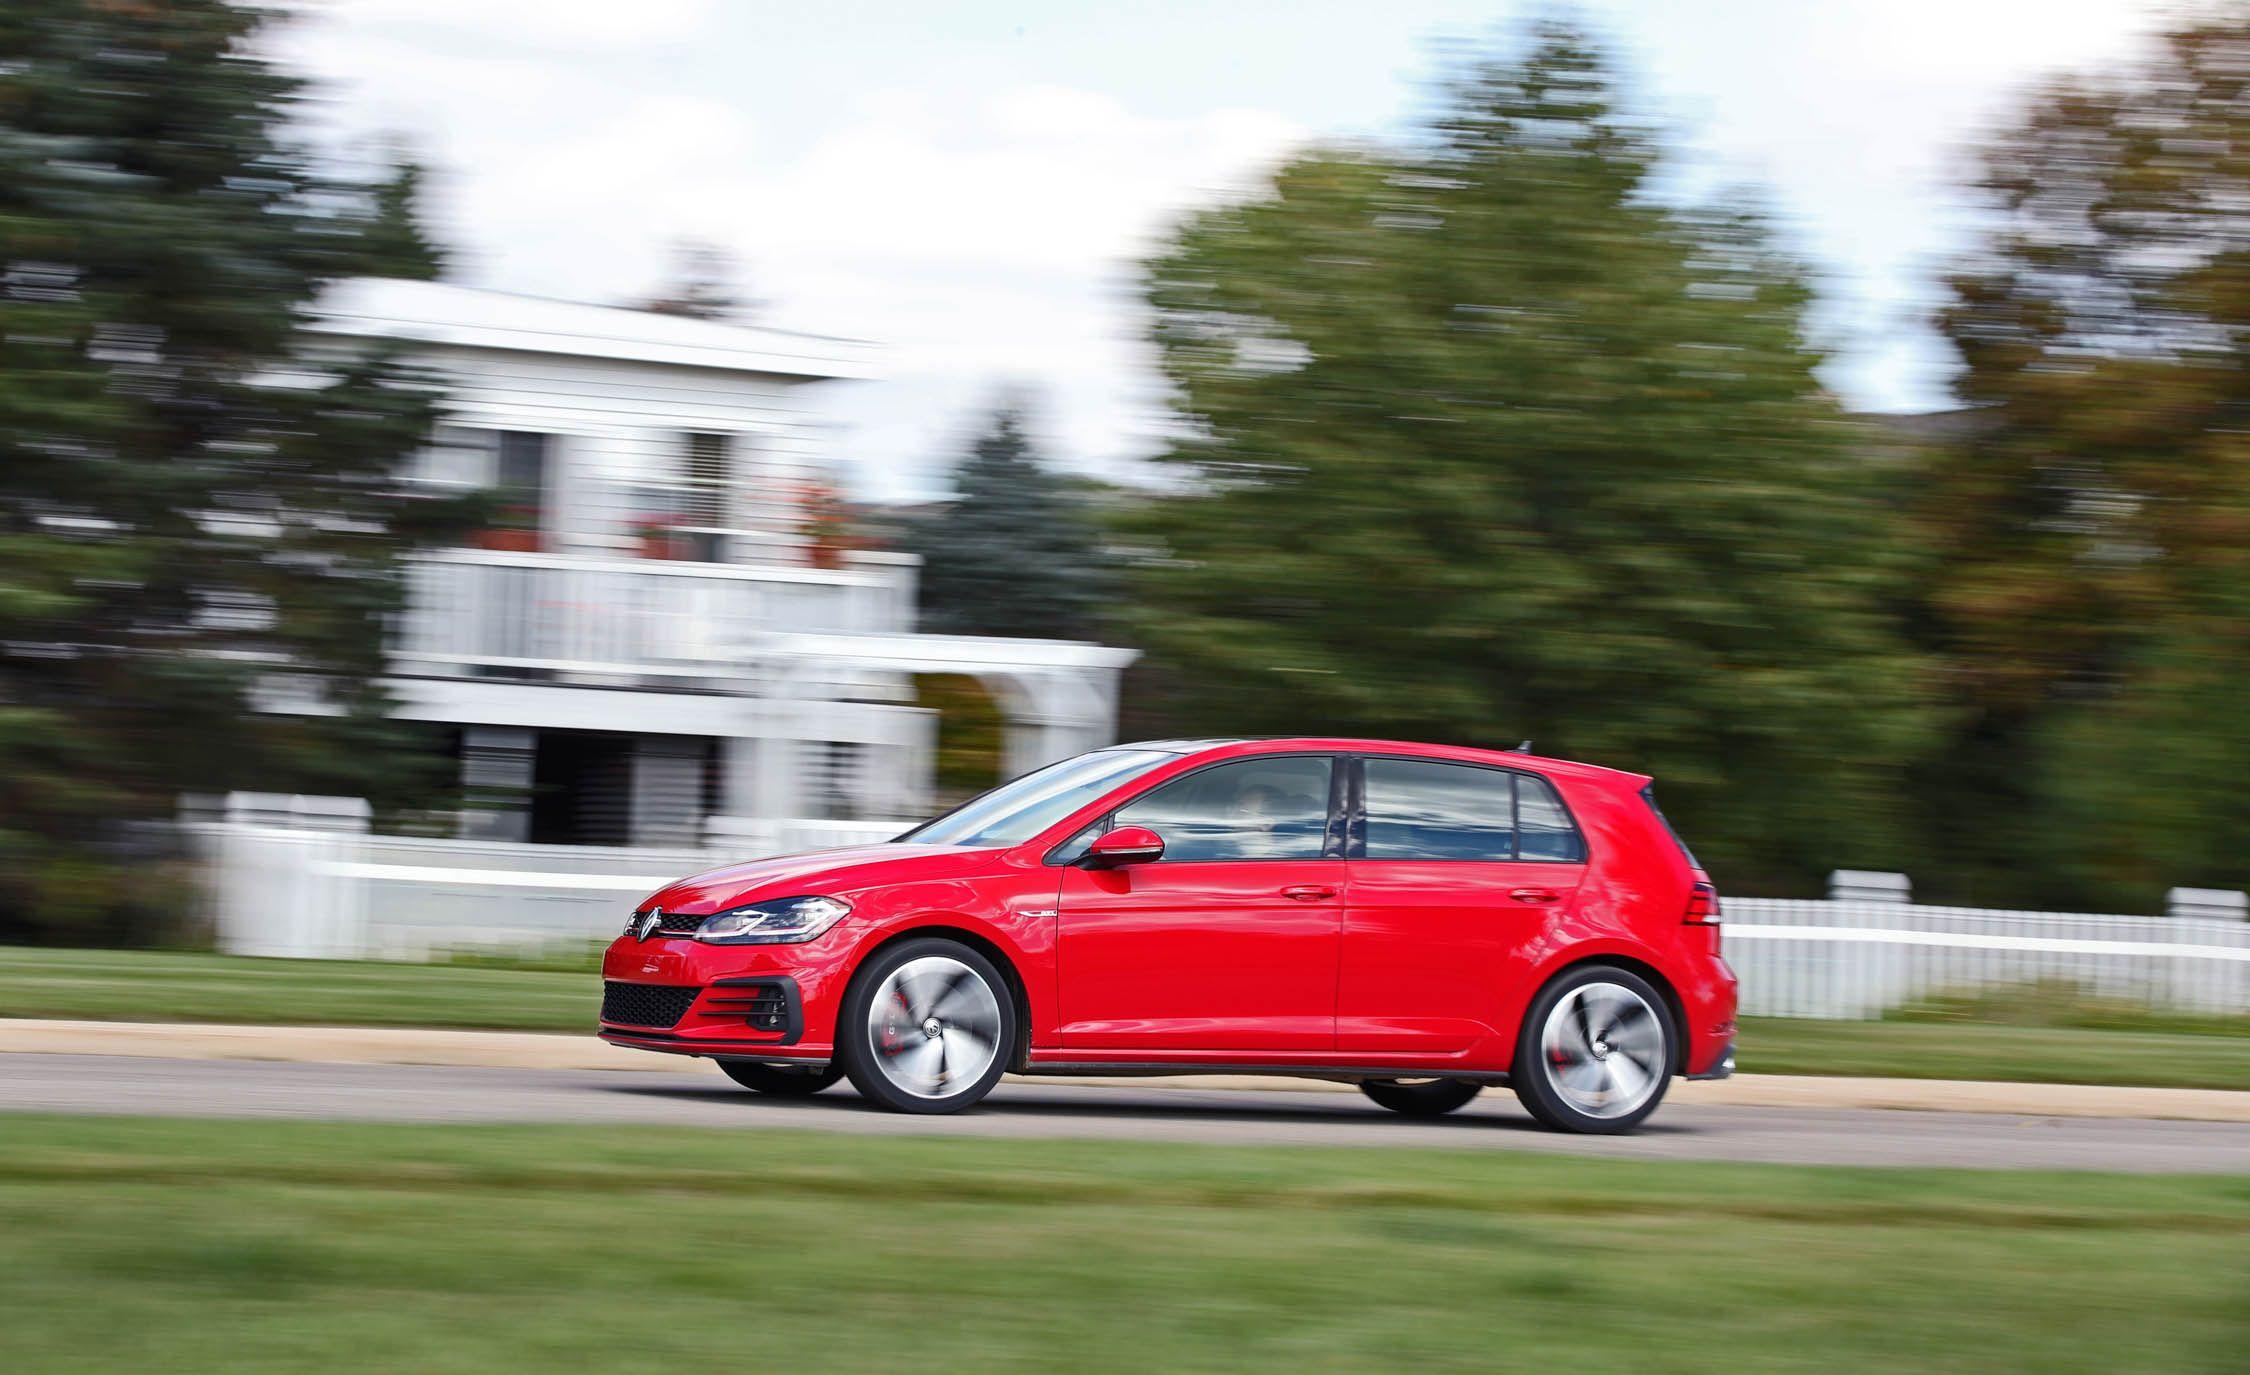 Gentil Volkswagen Golf Gti Back Fire Car Misoprostol Us